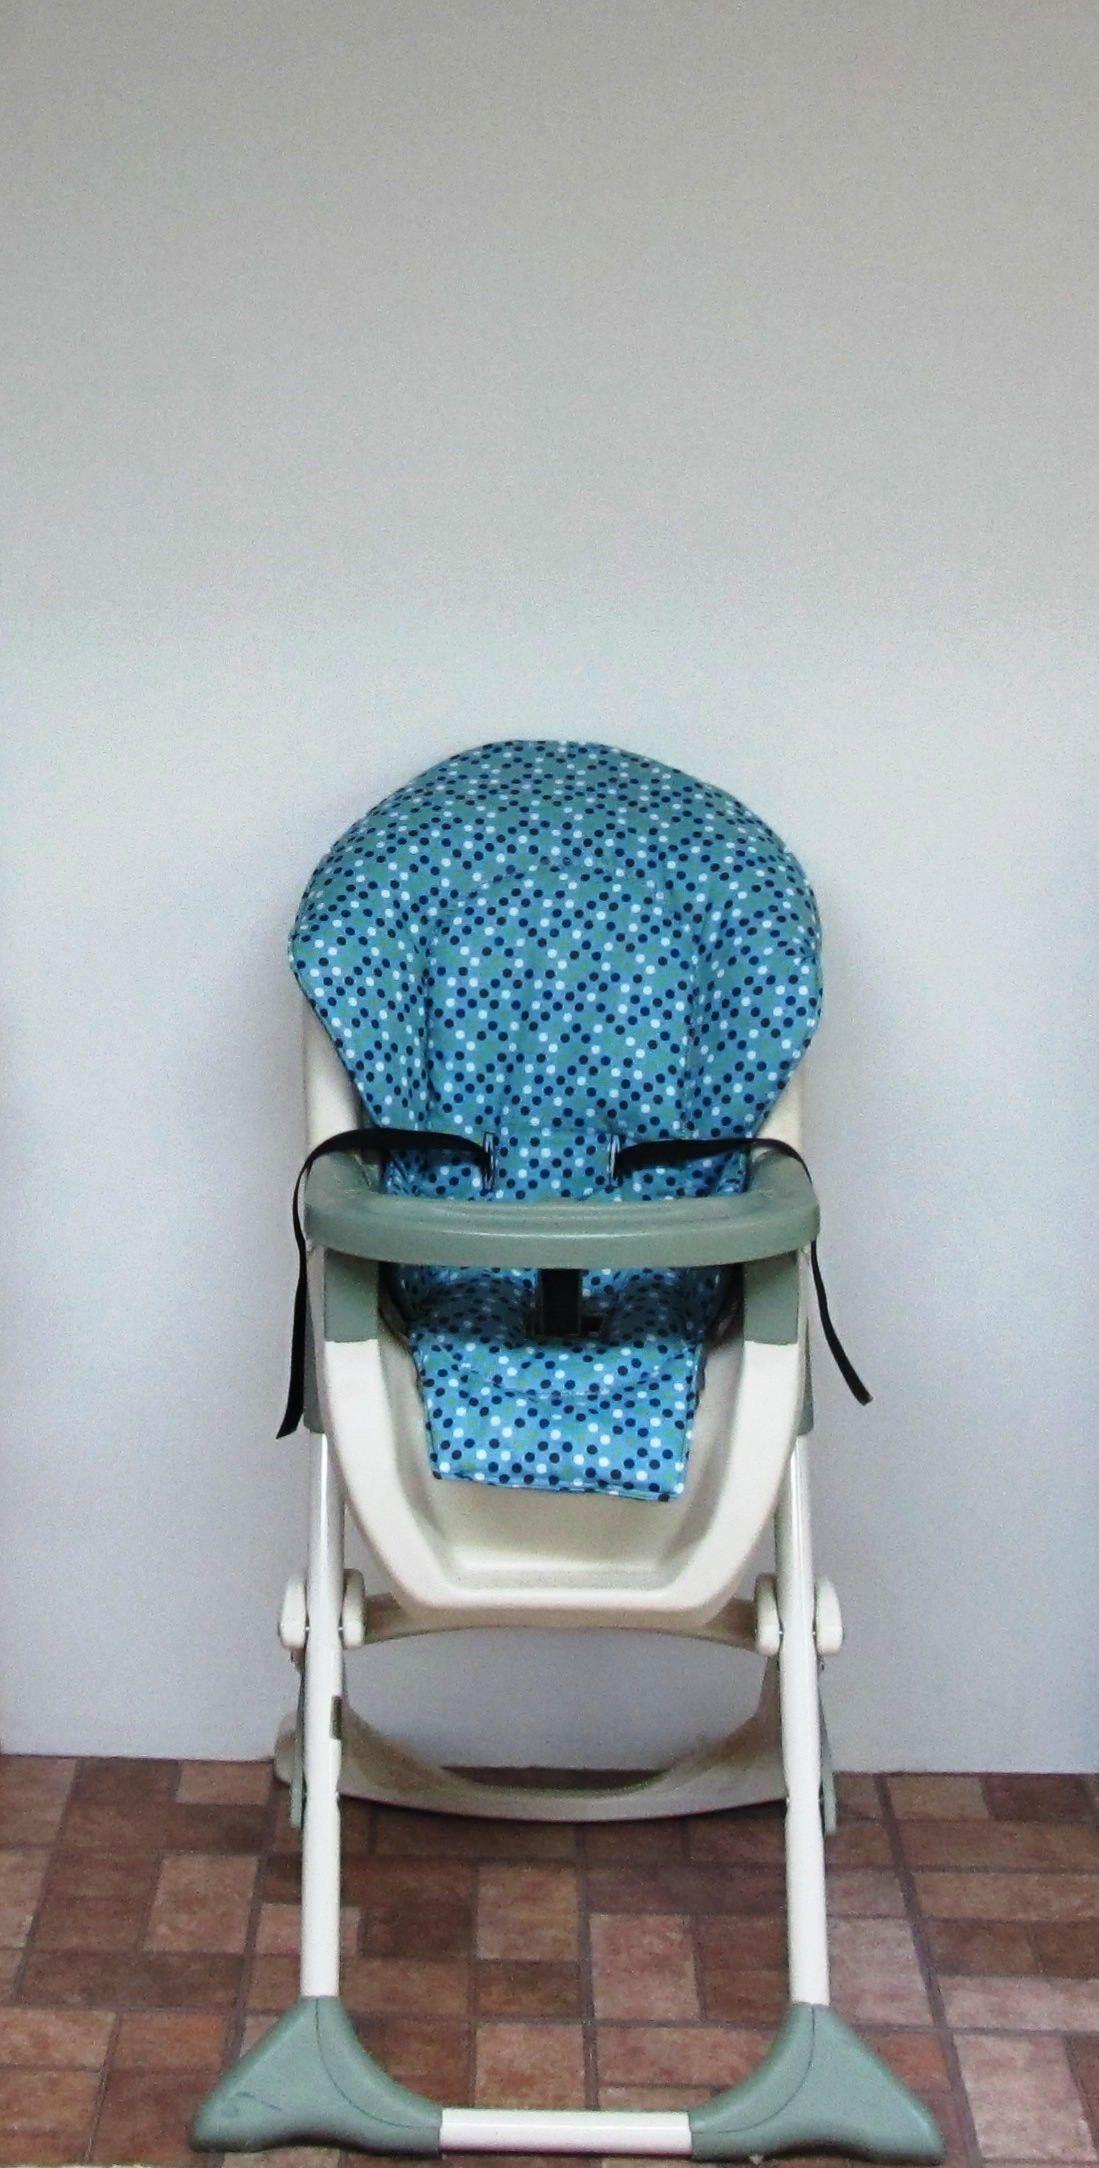 evenflo cotton highchair replacement pad custom high chair cushion